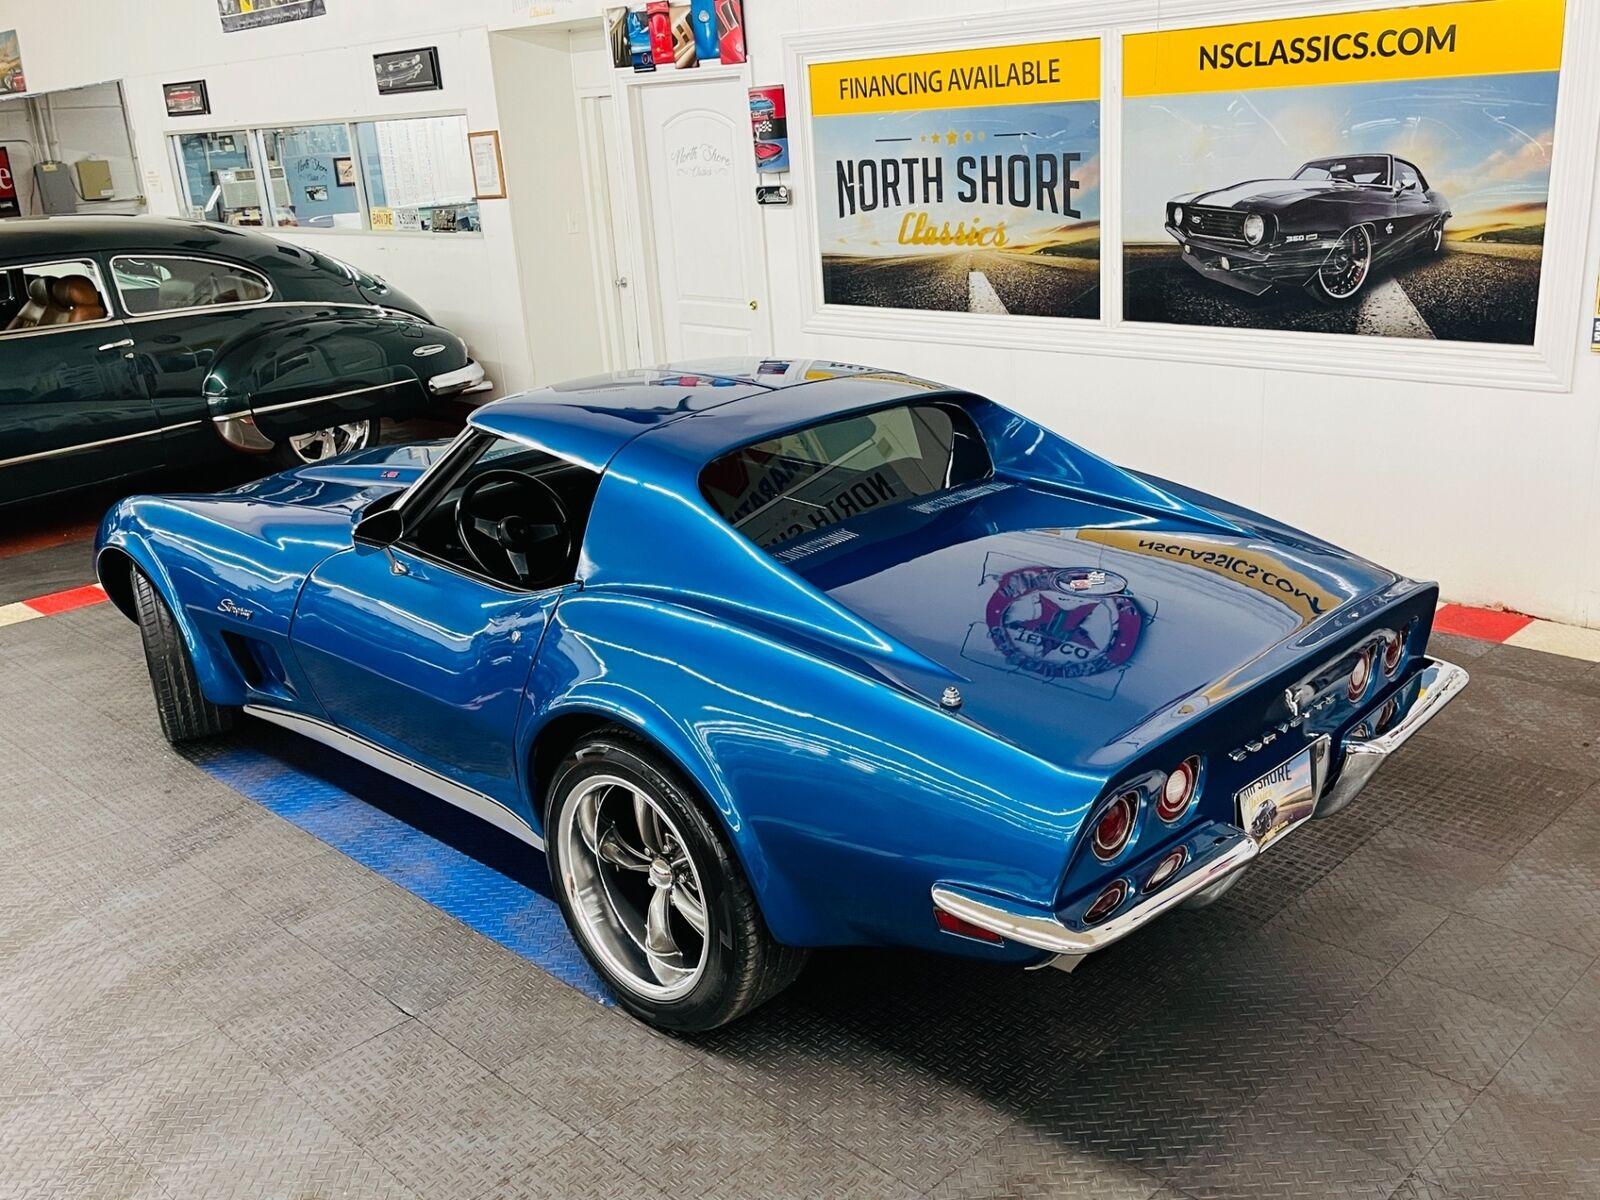 1973 Blue Chevrolet Corvette Coupe  | C3 Corvette Photo 3